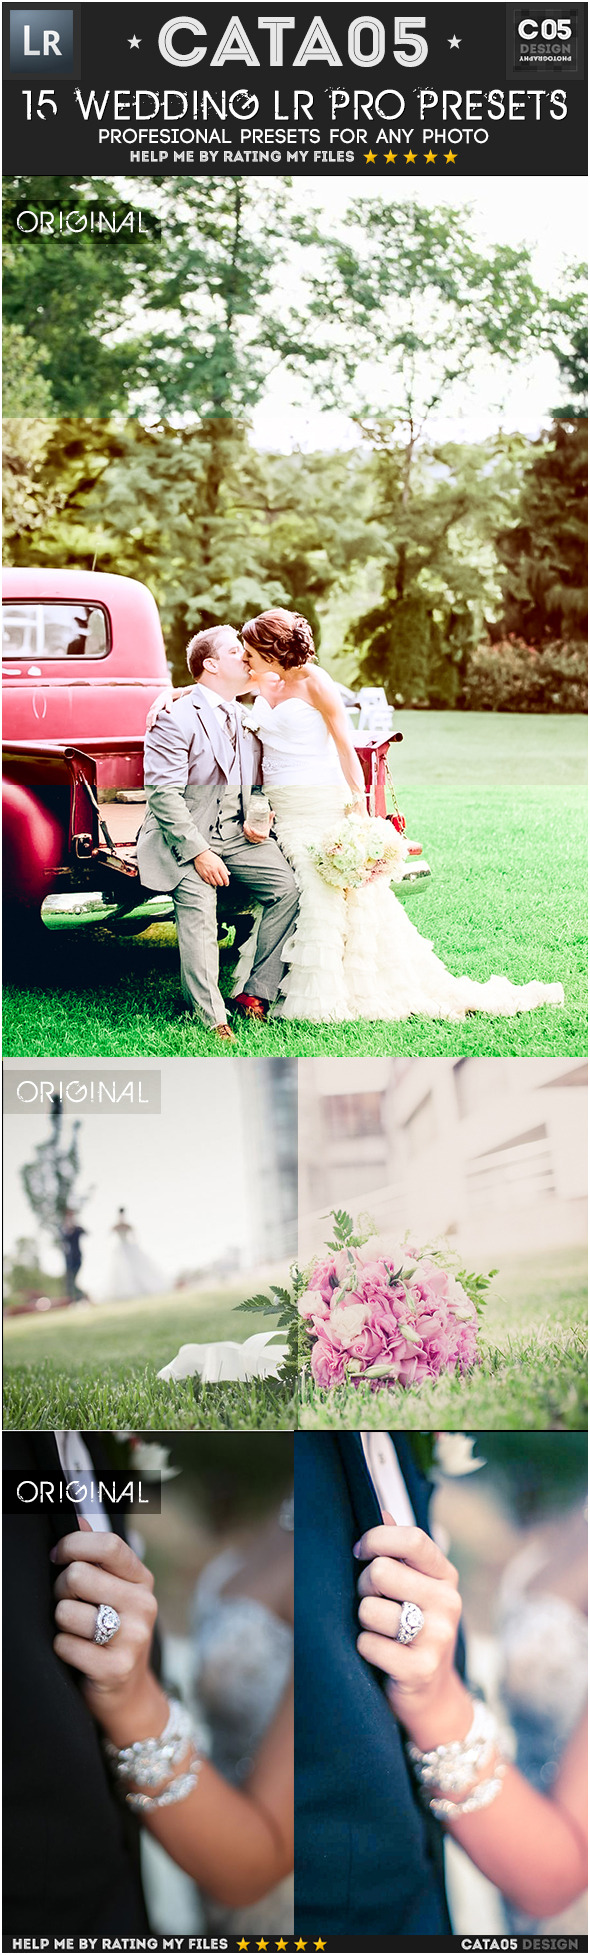 15 Wedding Pro Presets - Wedding Lightroom Presets